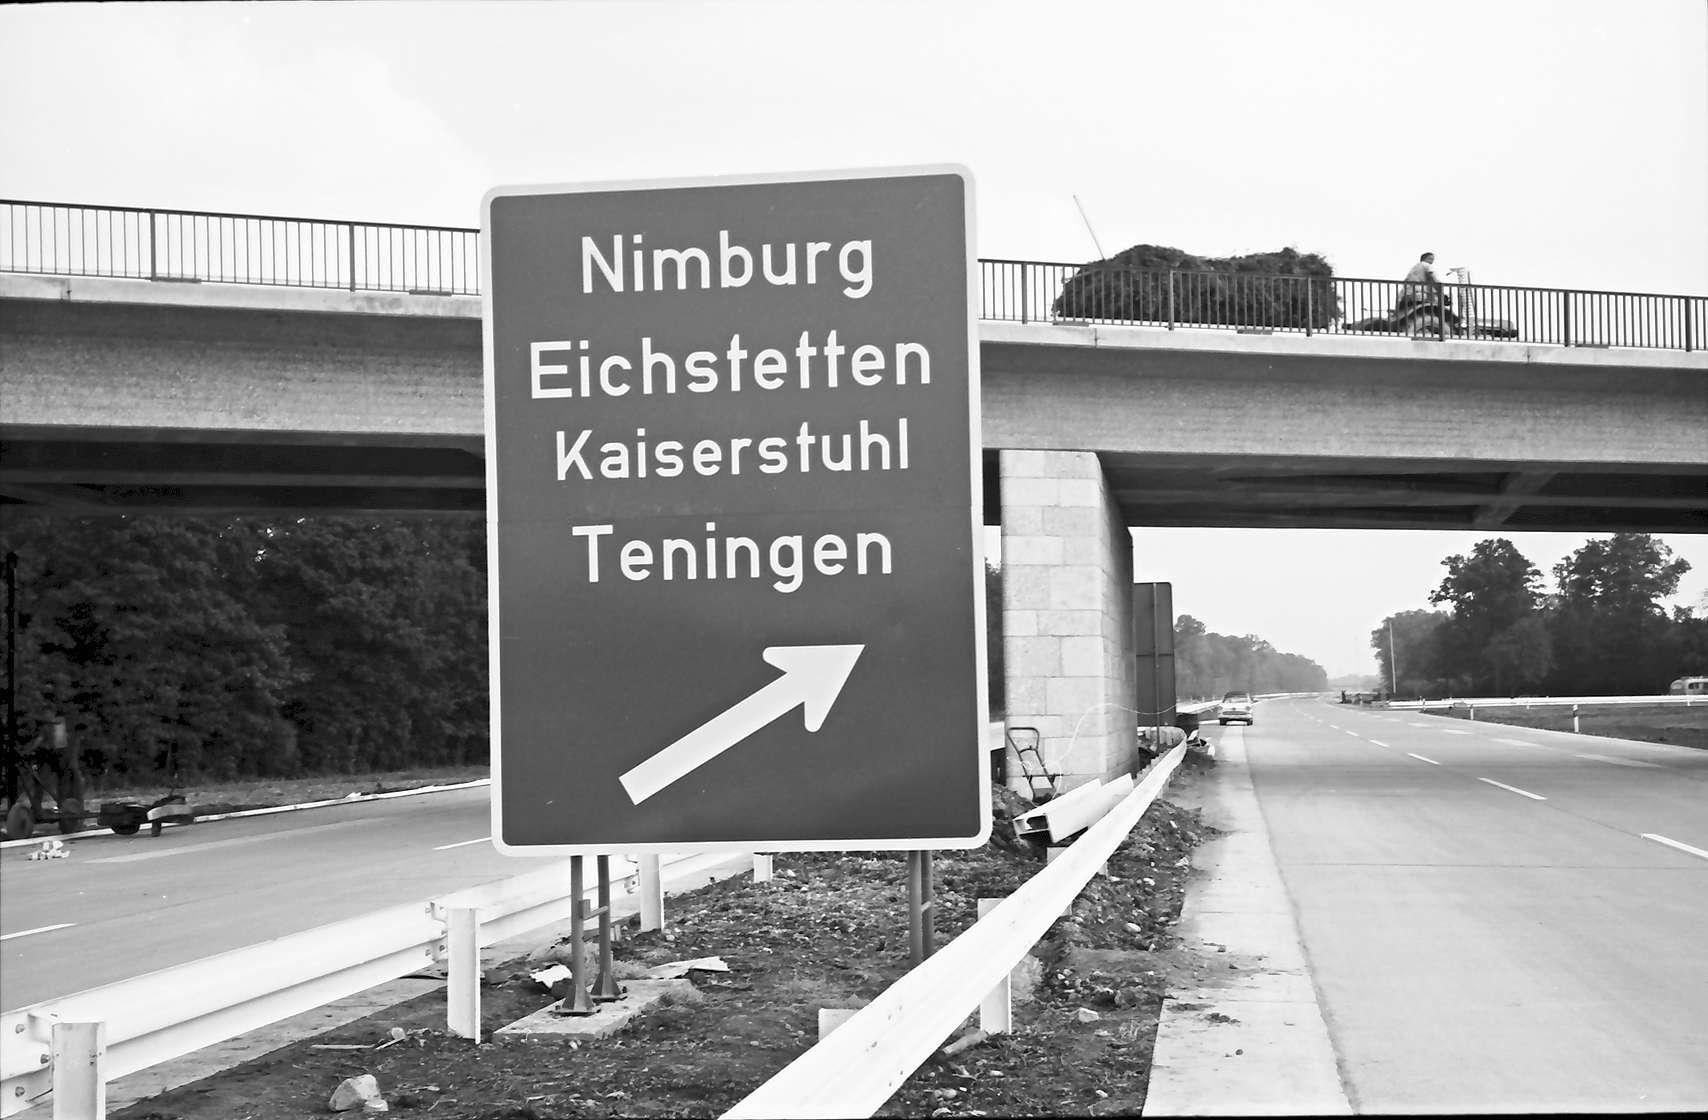 Teningen: Knoten Teningen; Ausfahrschild: Nimburg/Kaiserstuhl usw., Bild 1